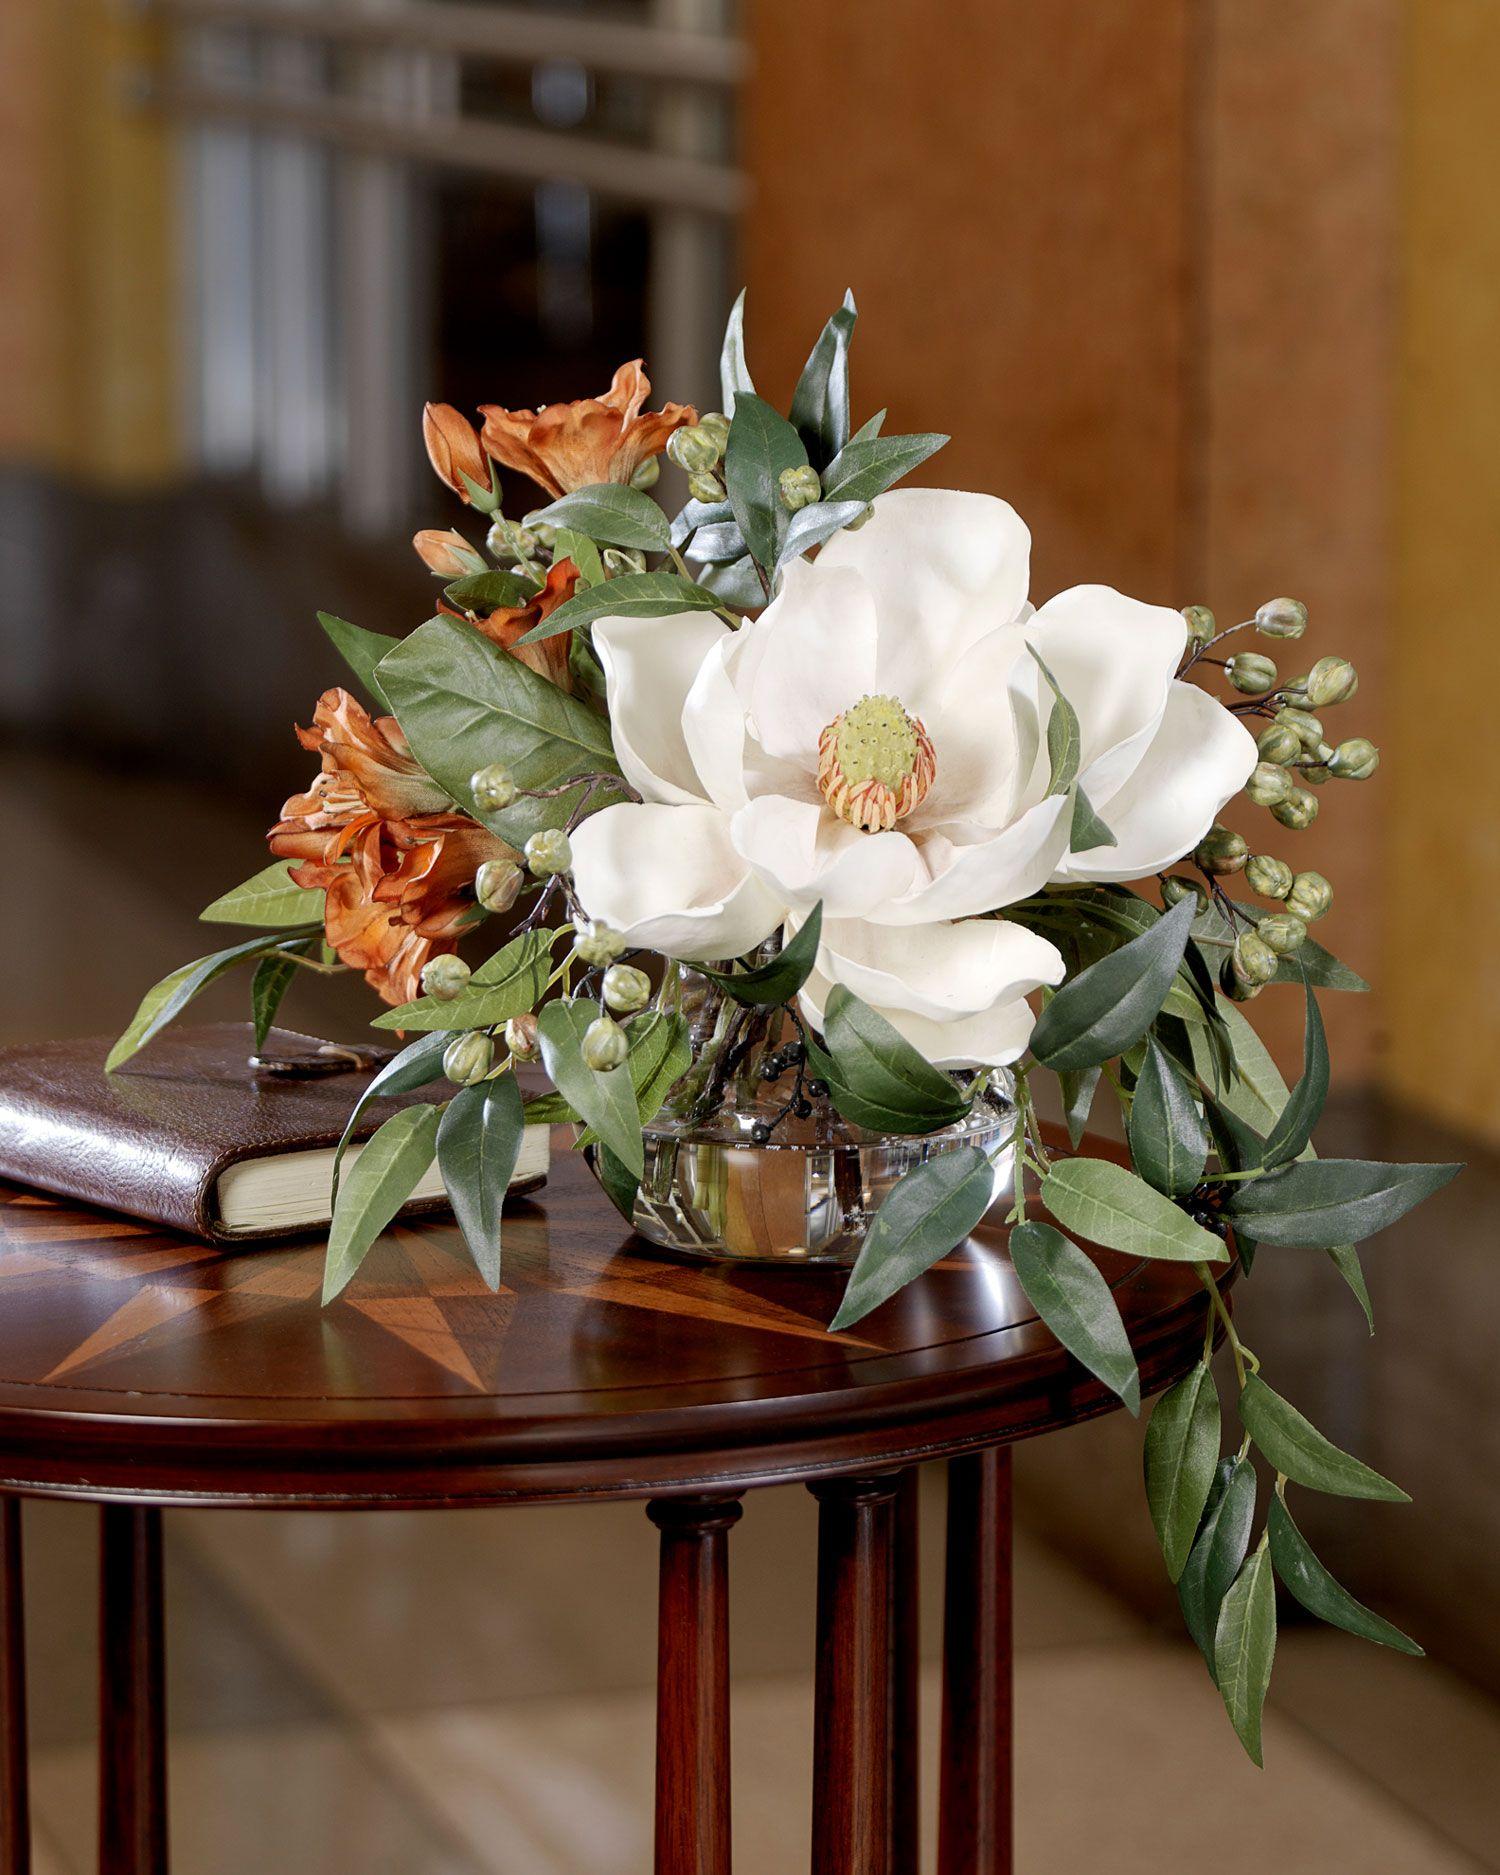 Southern charm silk flower arrangement silk flowers flower southern charm silk flower arrangement izmirmasajfo Image collections